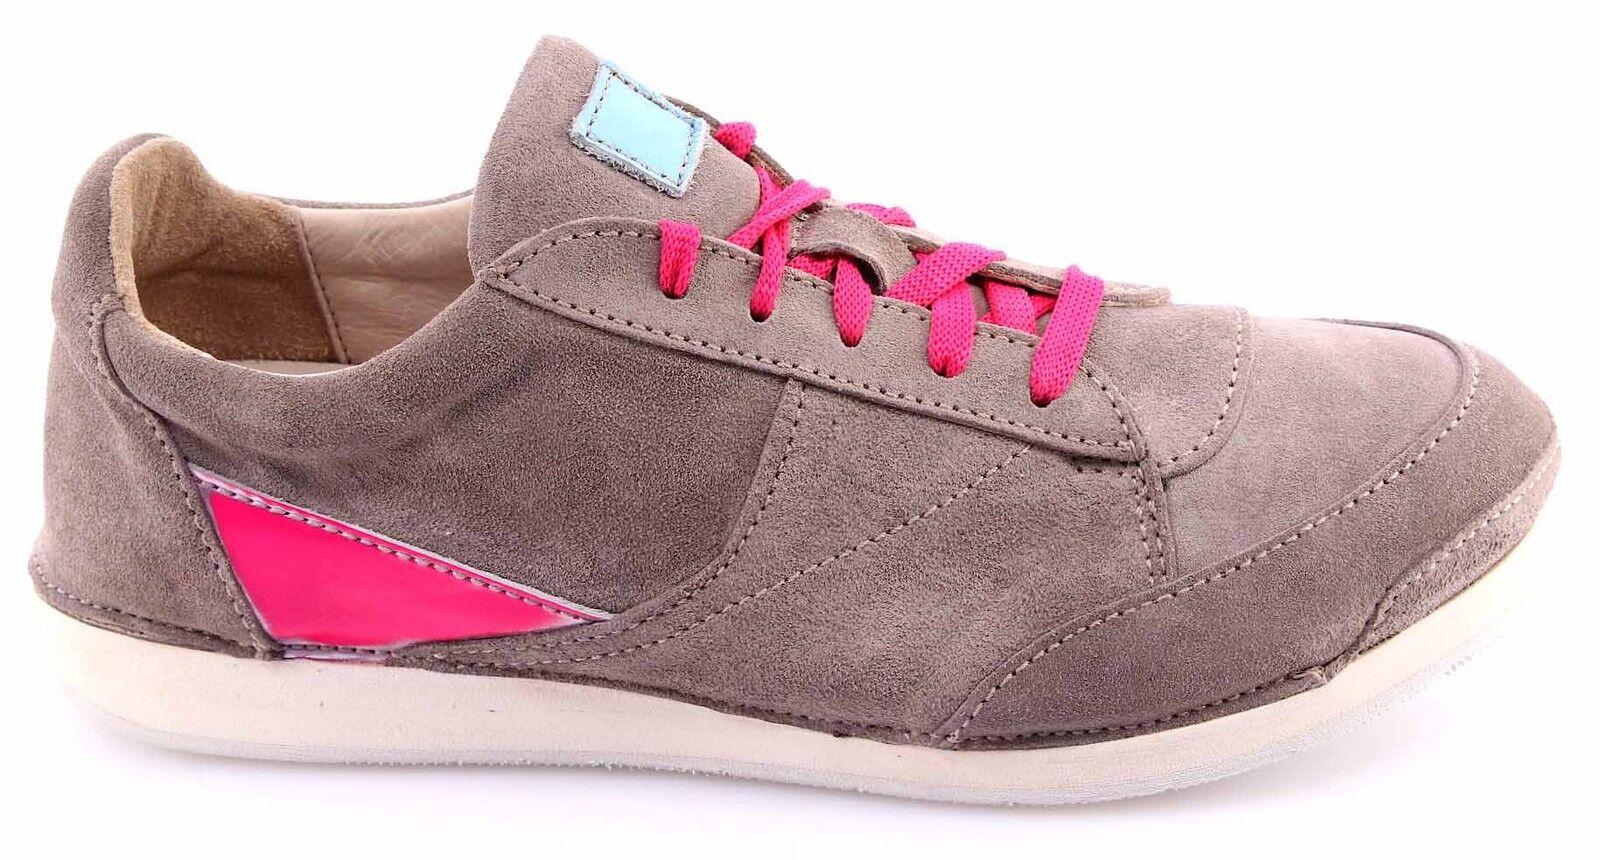 Zapatos Sneakers Mujeres MOMA GLOVF-VG Softy Smog Gamuza Gris Vintage Nueva